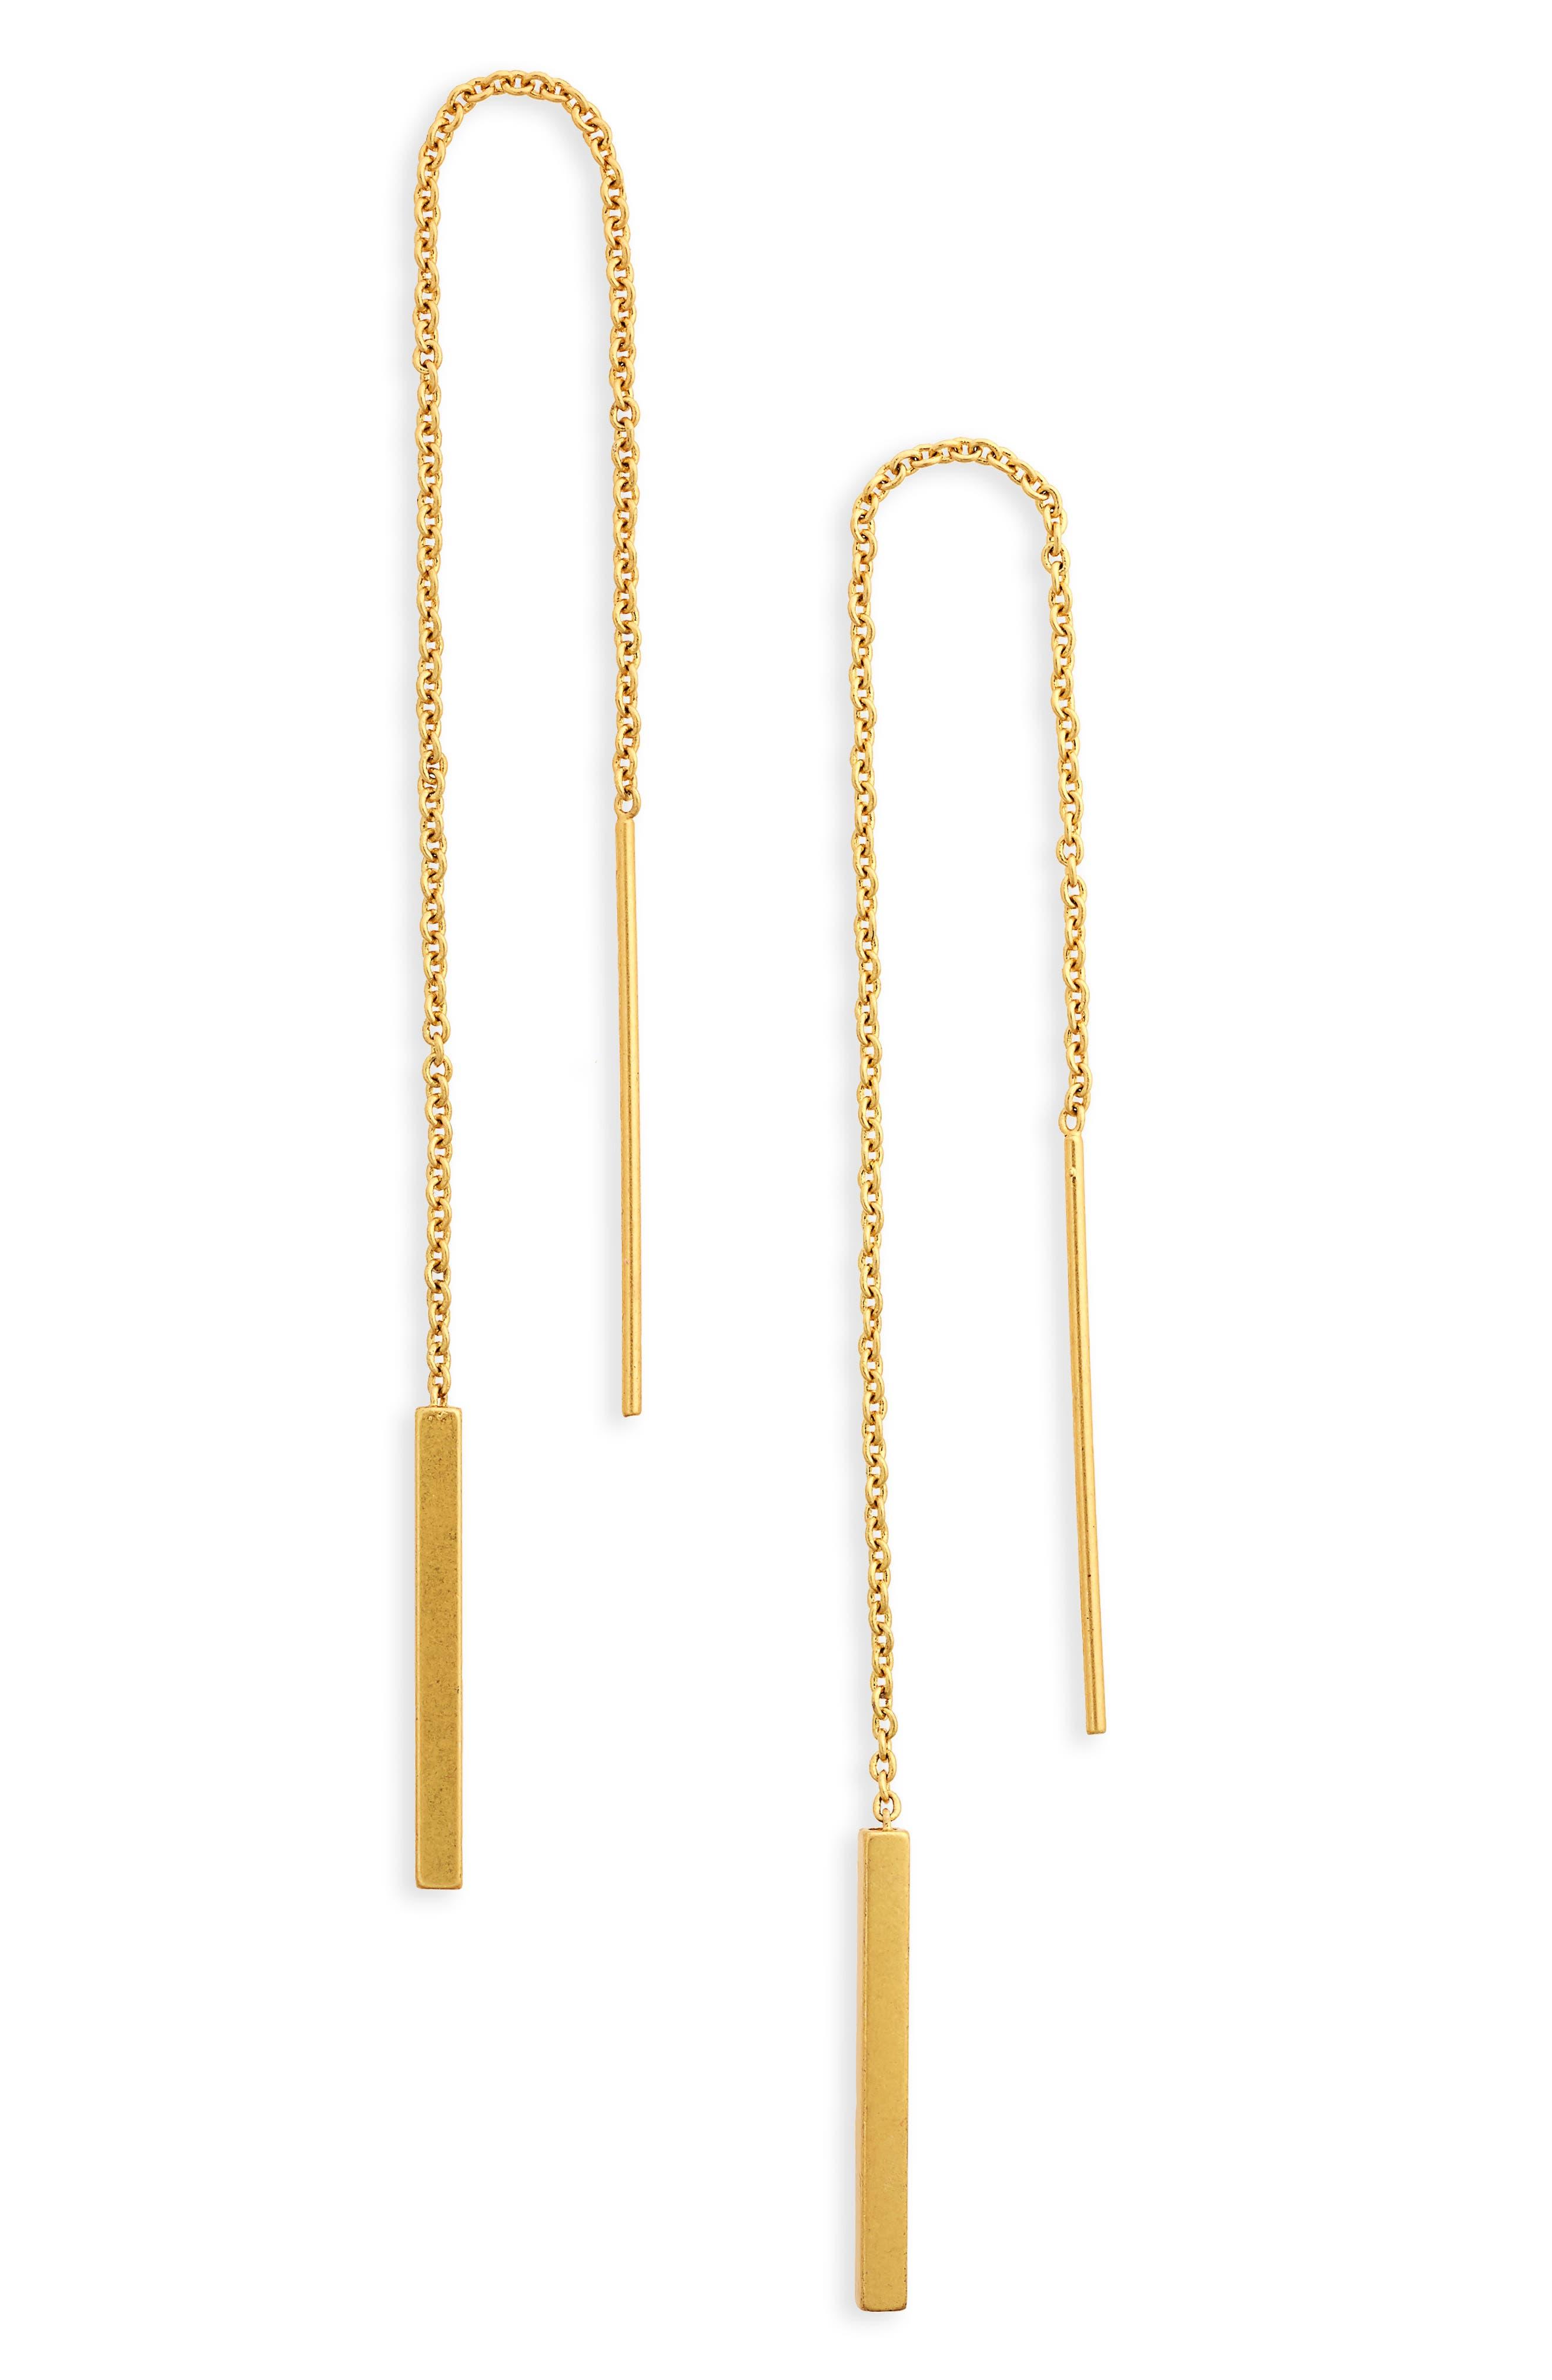 Delicate Threader Earrings,                             Main thumbnail 1, color,                             710